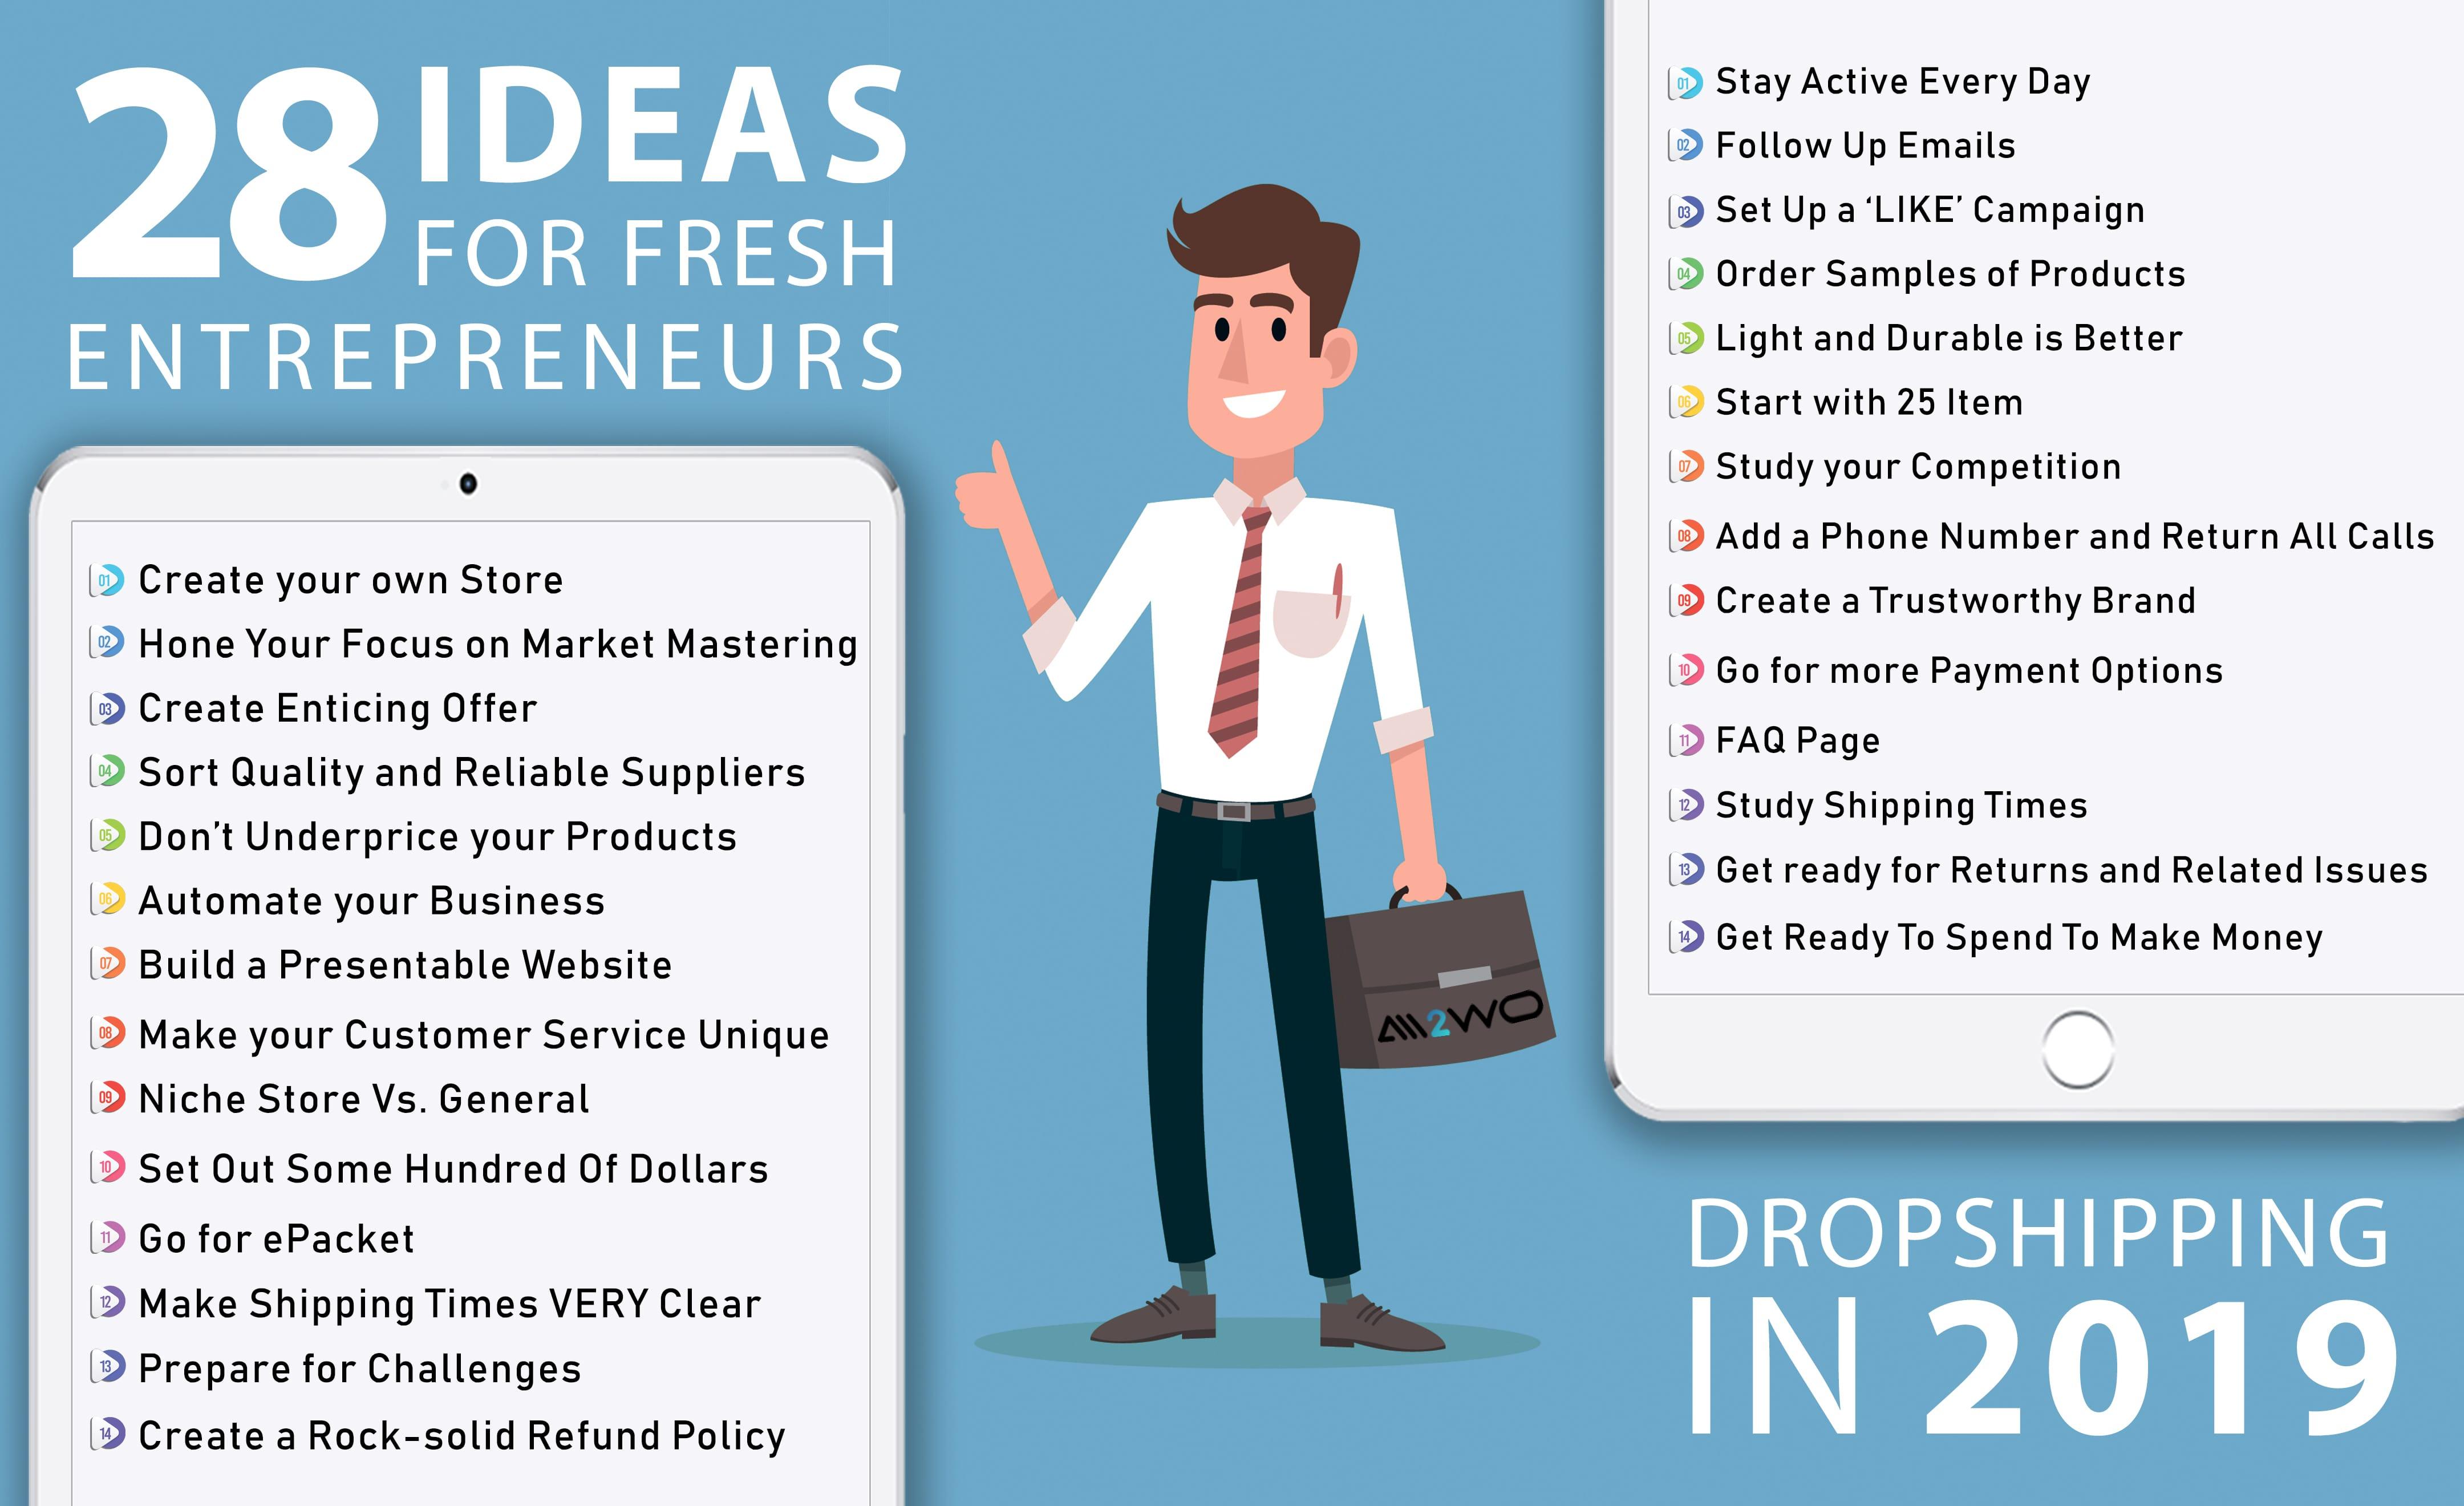 28-ideas-for-entrepreneurus